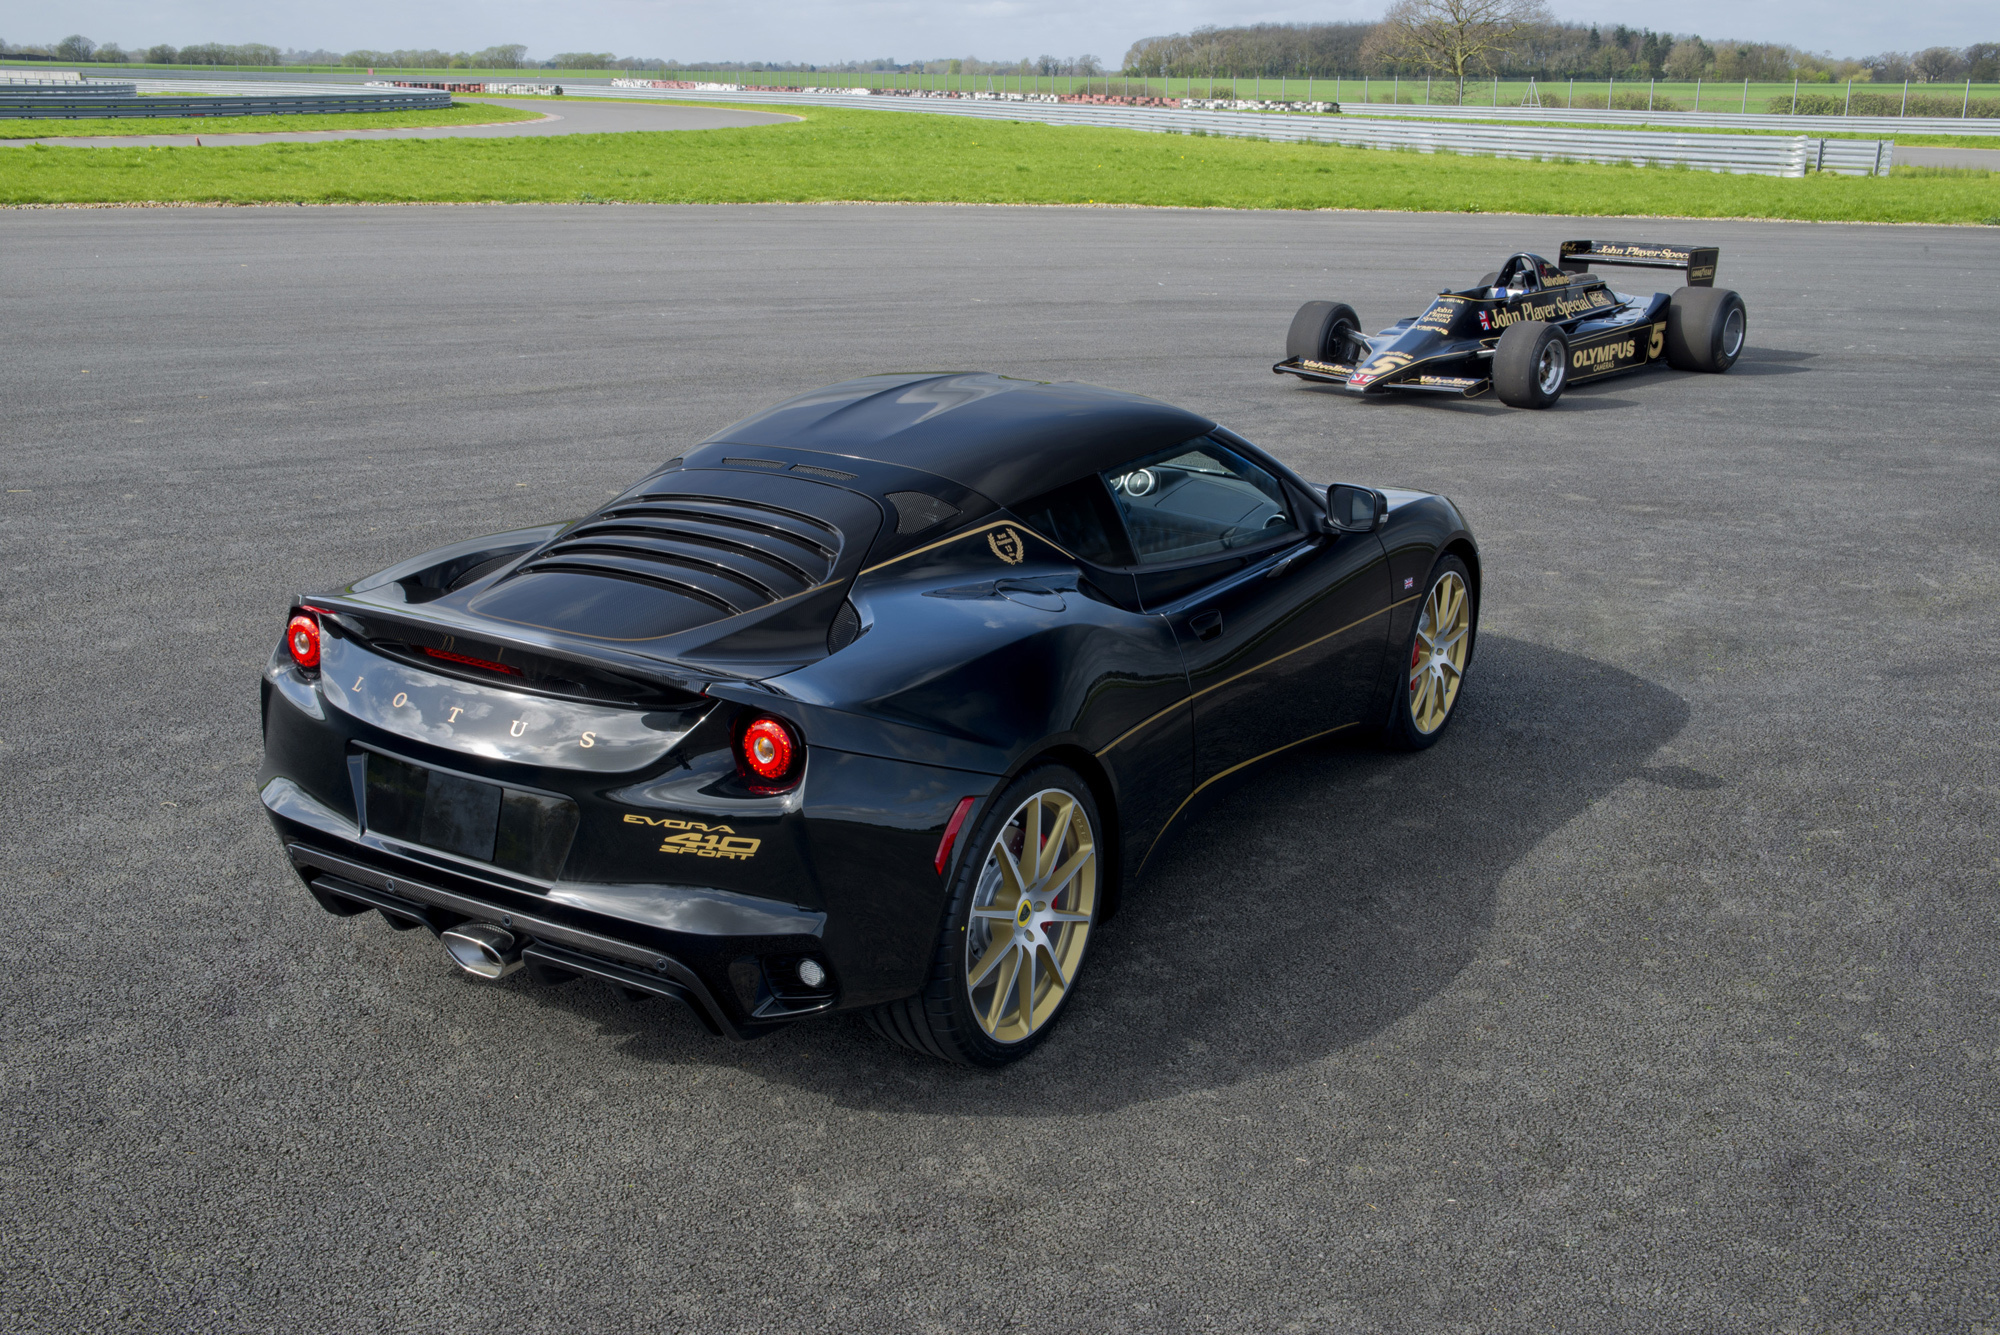 lotus evora sport 410 gp wallpapers images photos pictures backgrounds. Black Bedroom Furniture Sets. Home Design Ideas